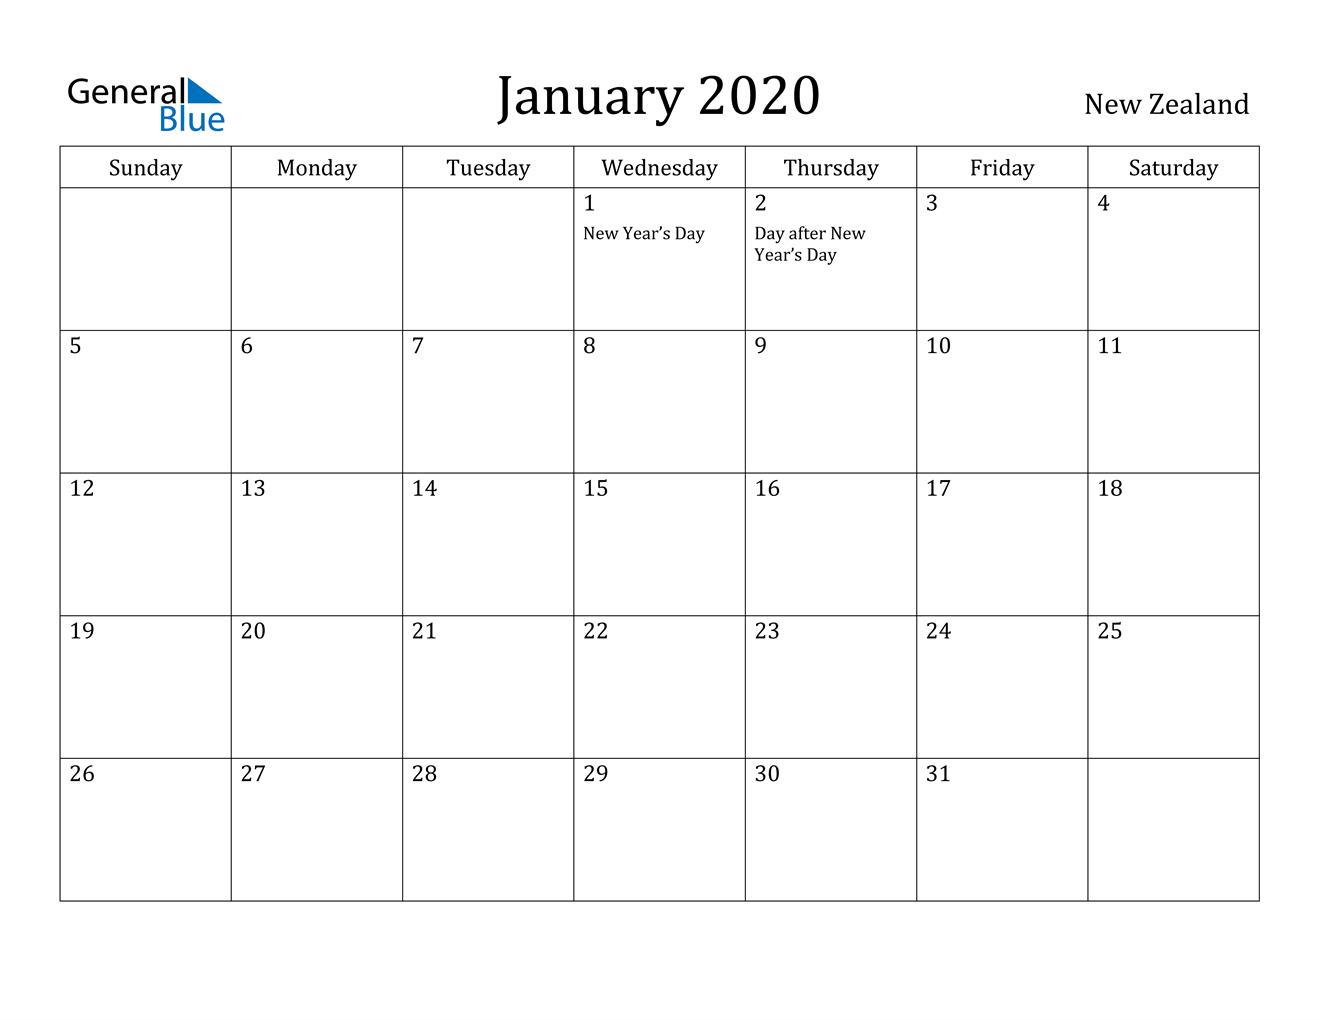 January 2020 Calendar - New Zealand